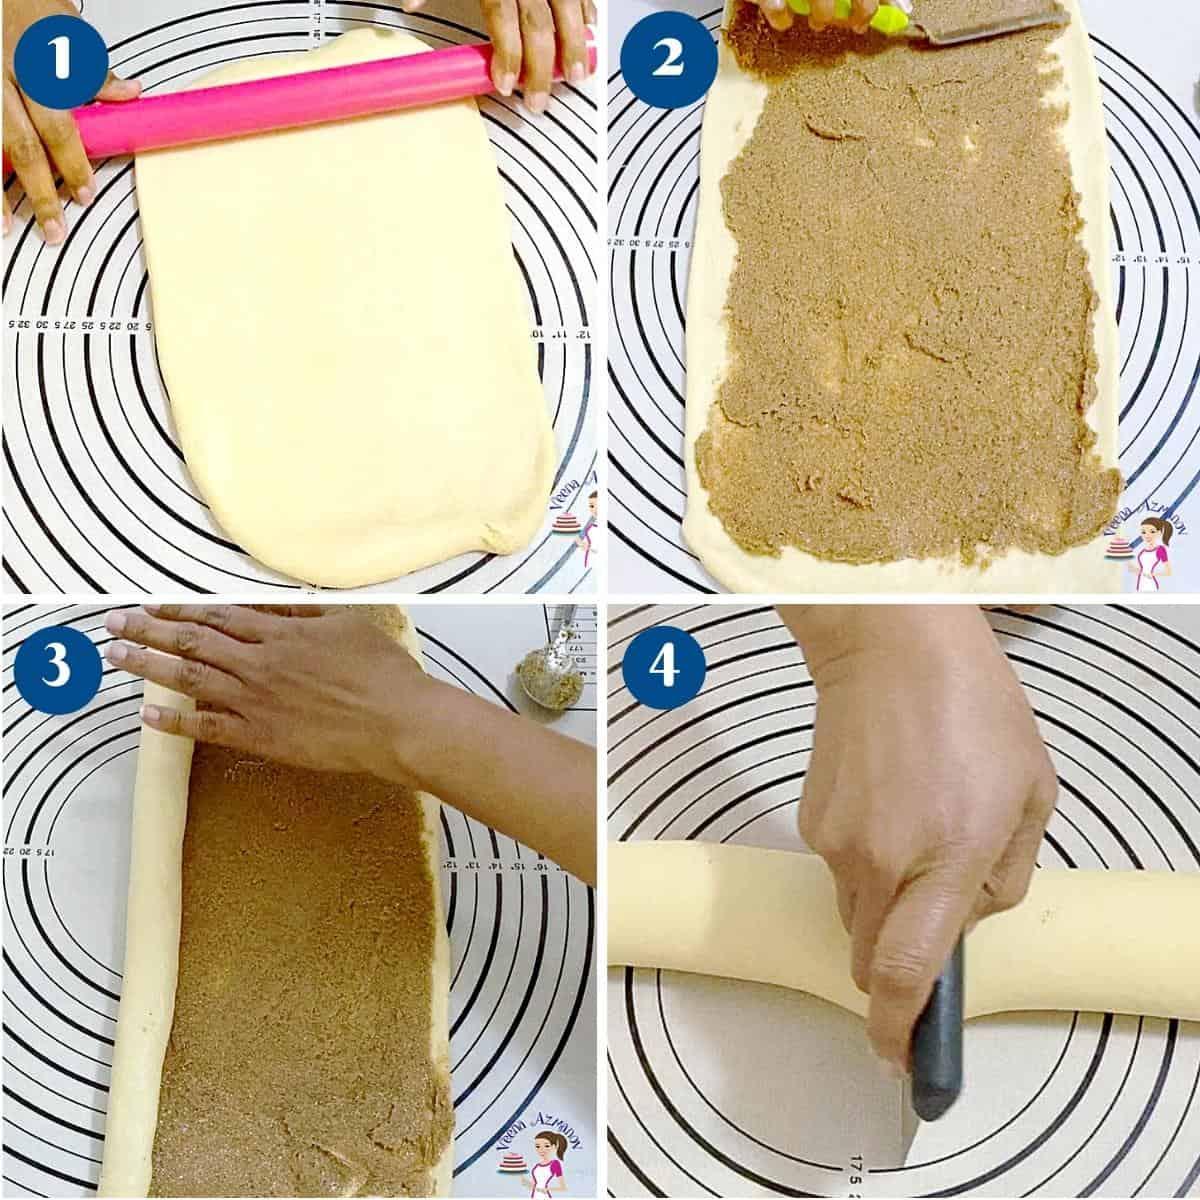 Progress pictures spreading the cinnamon sugar on the dough.